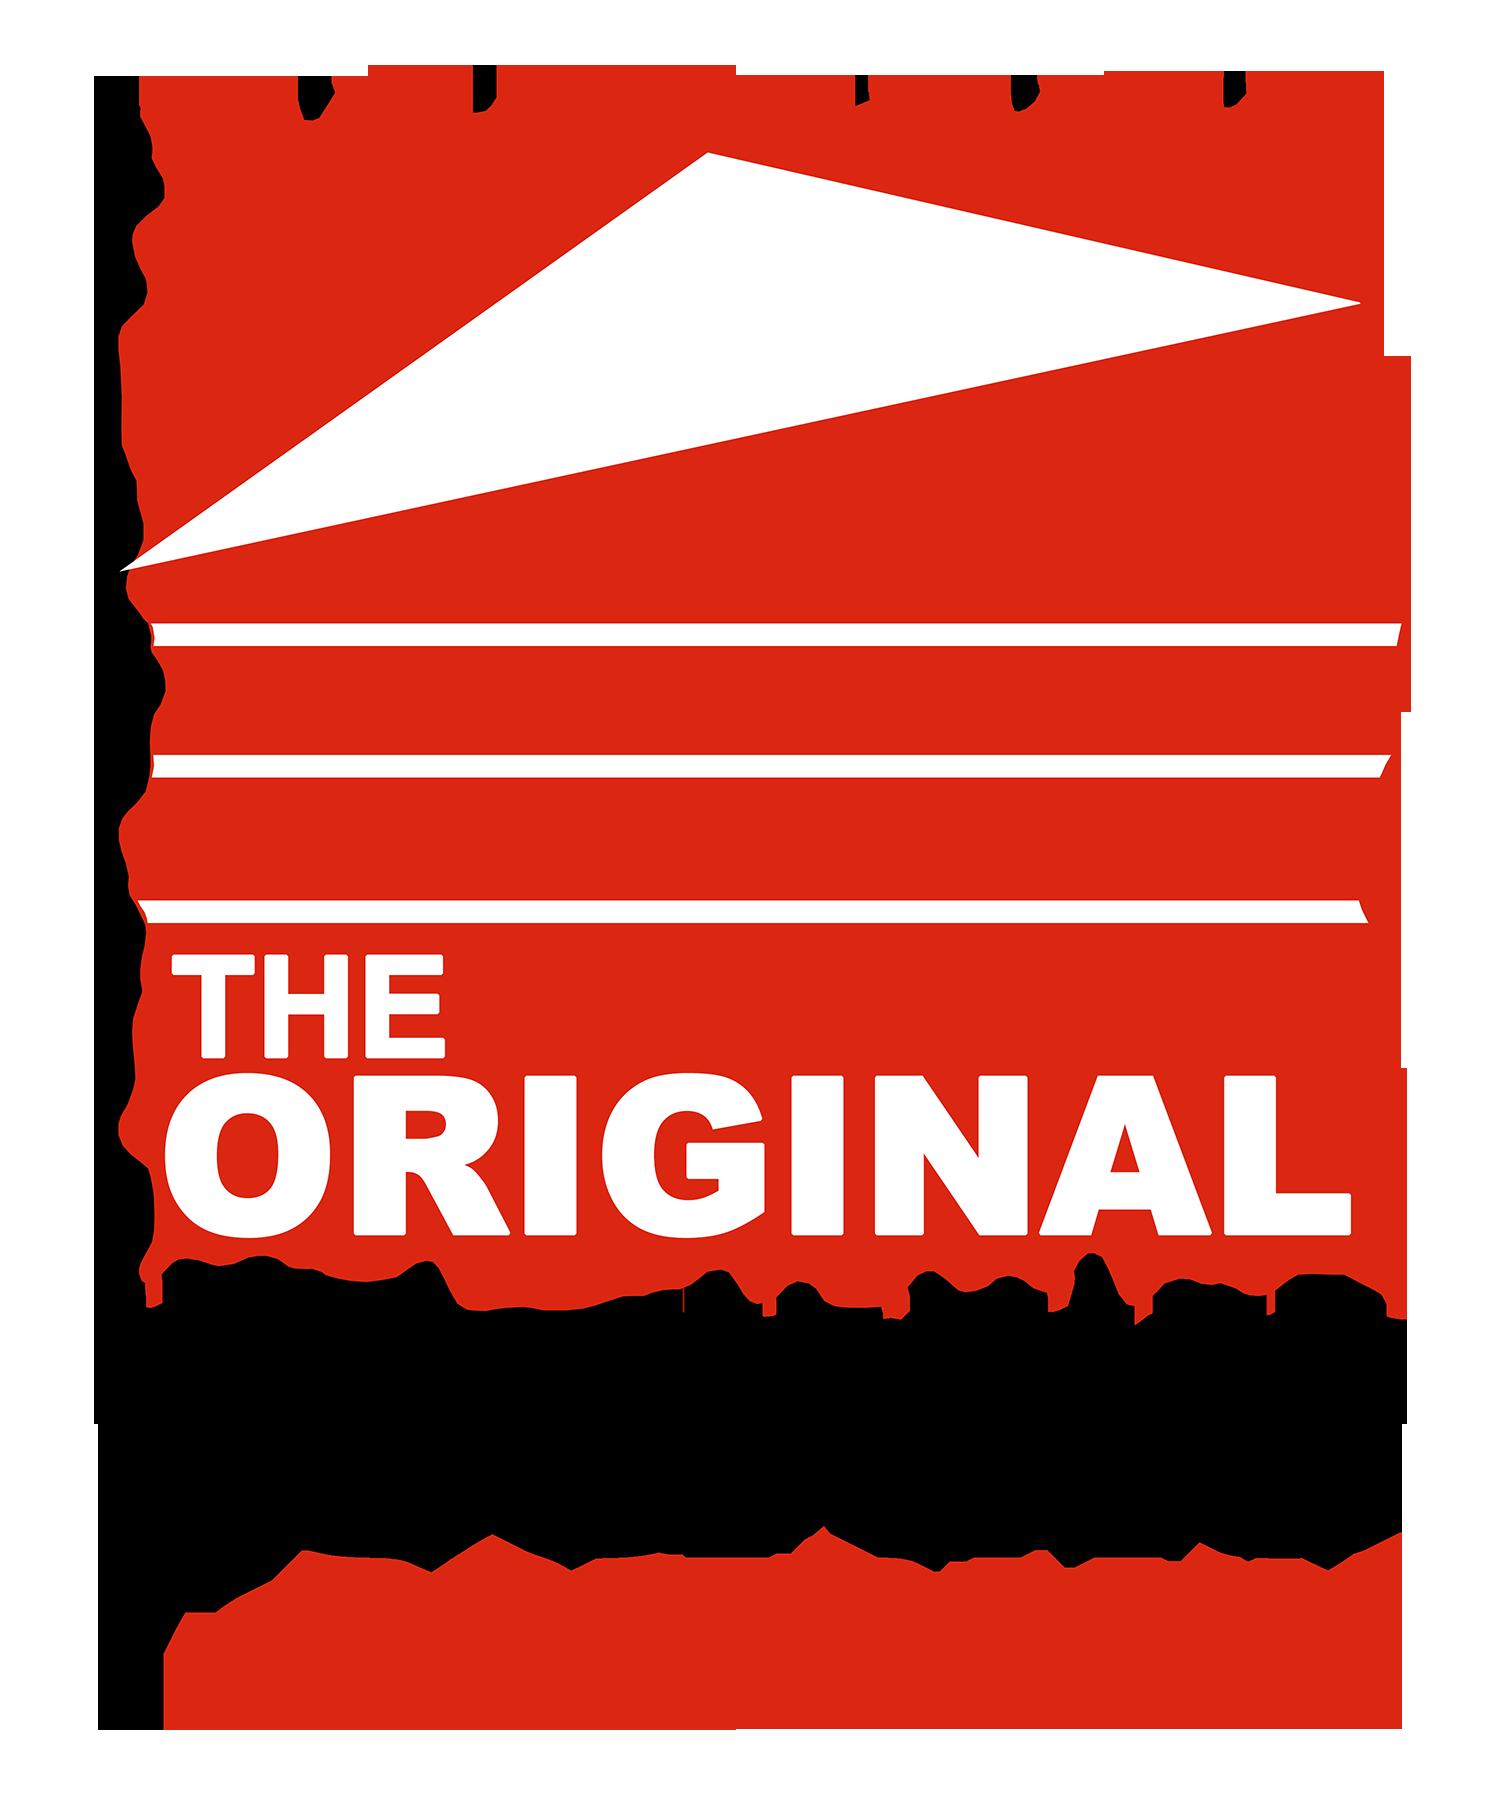 the original roofing company logo